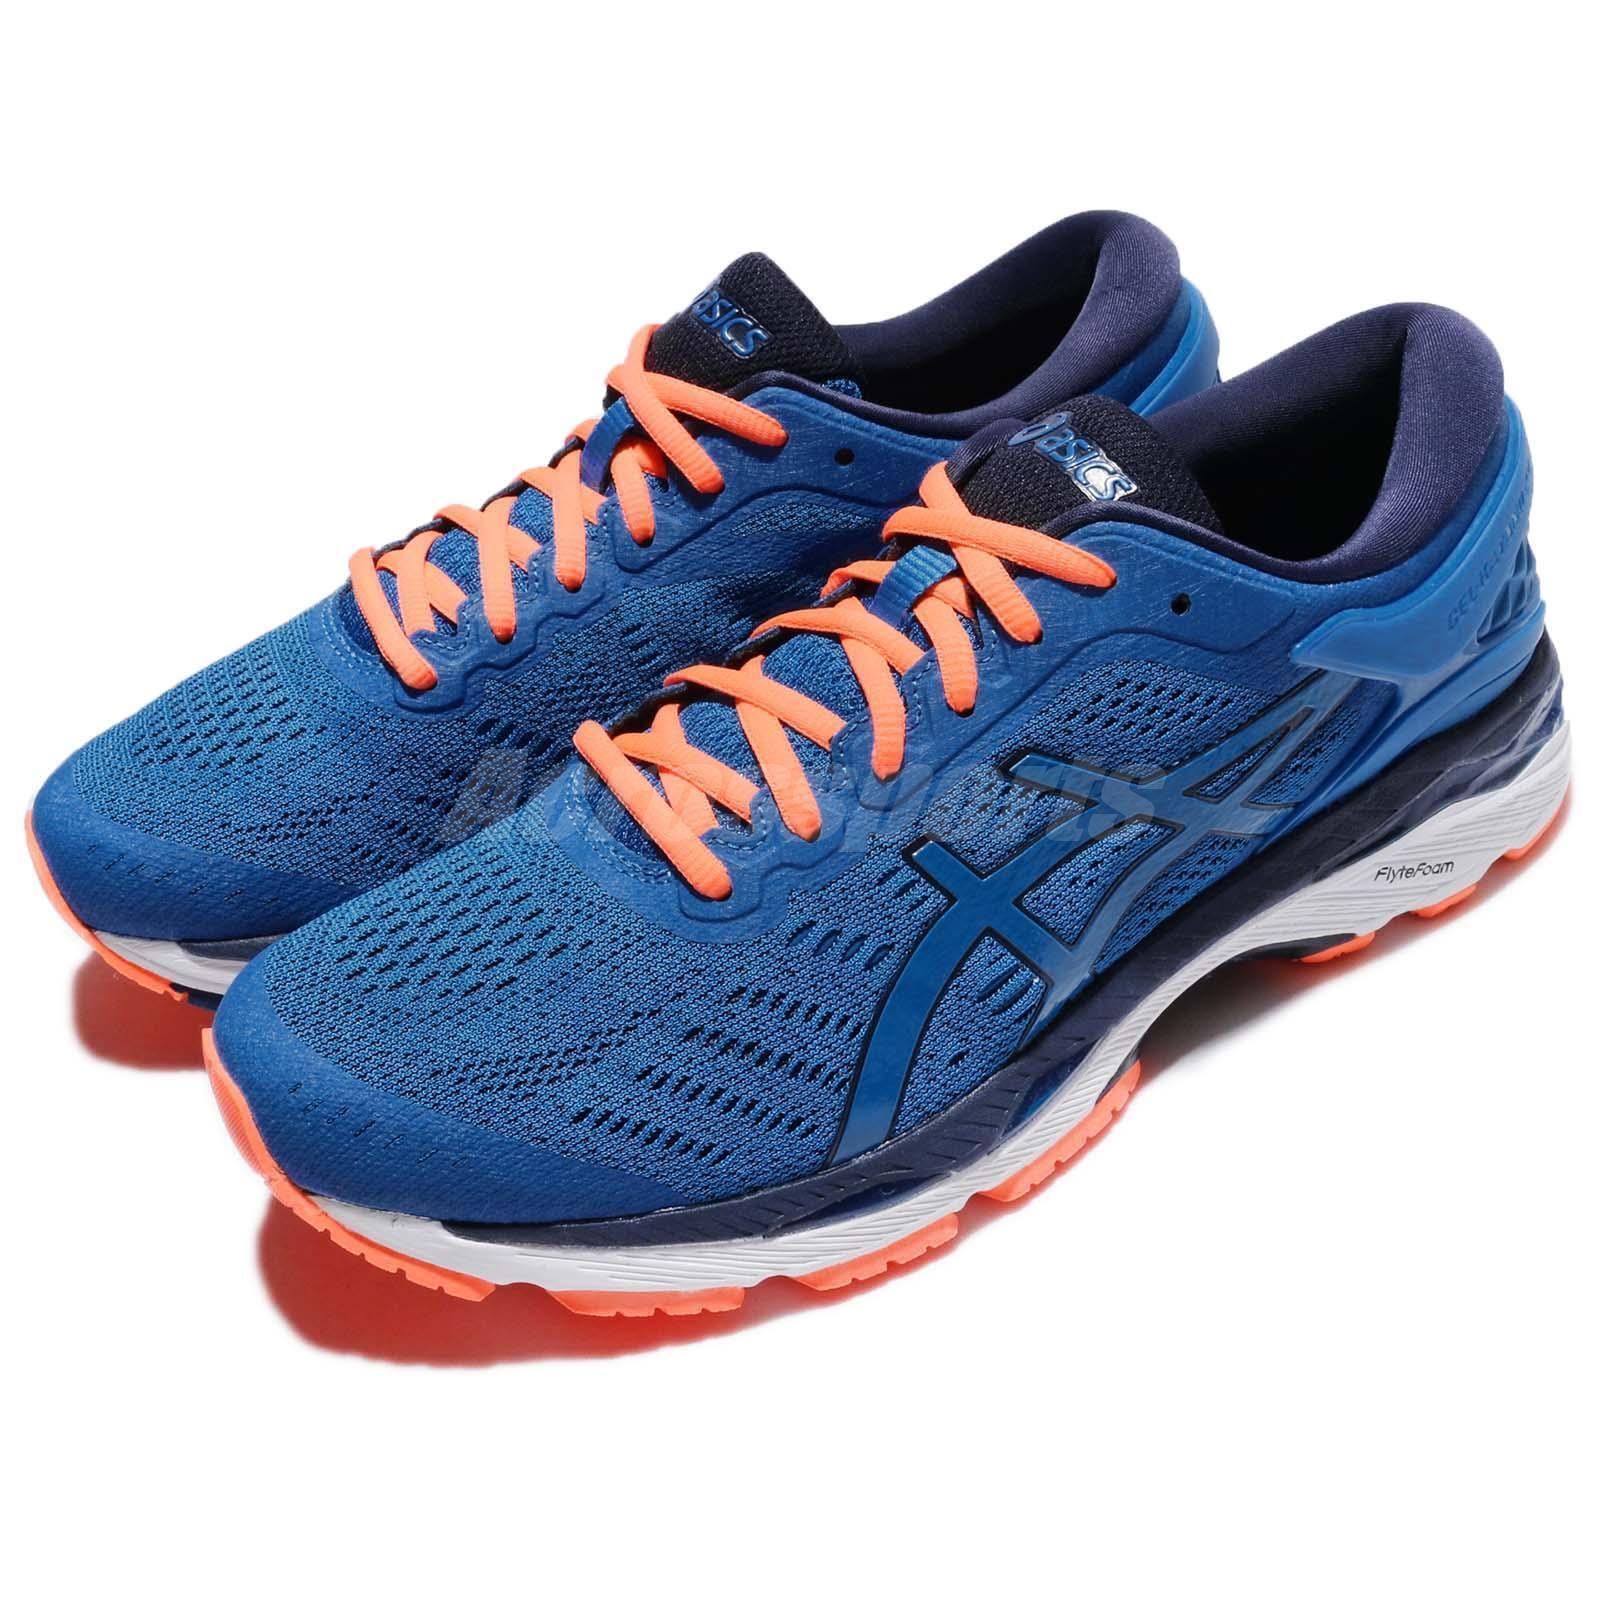 Asics Gel-Kayano 24 Directoire bleu Hot Orange hommes Running Chaussures T749N-4358